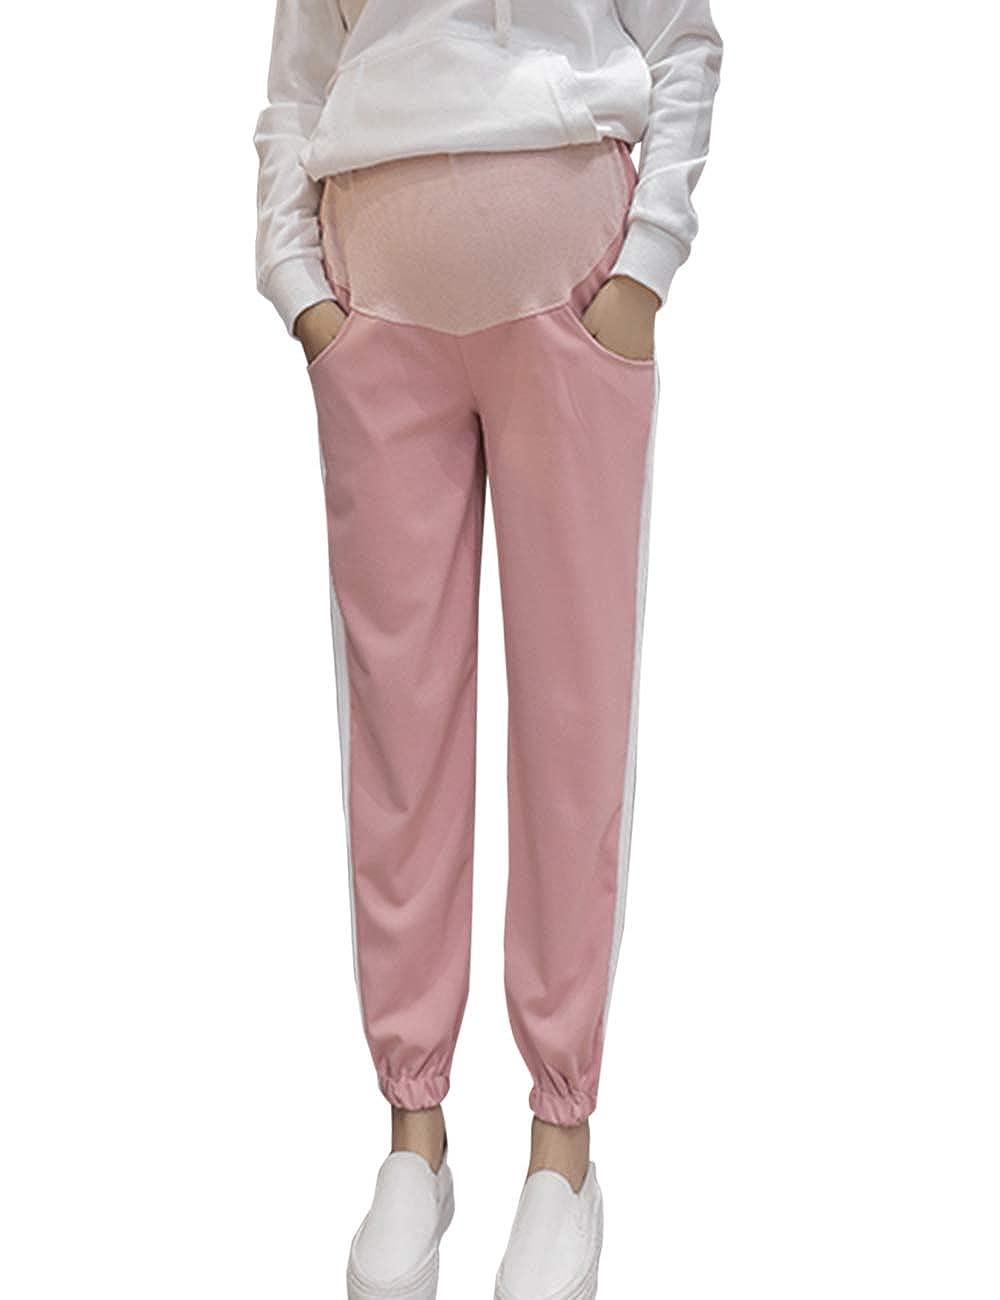 Zhhmeiruian Pregnant Women Cotton Maternity Pants - Maternity Sweatpants Cozy